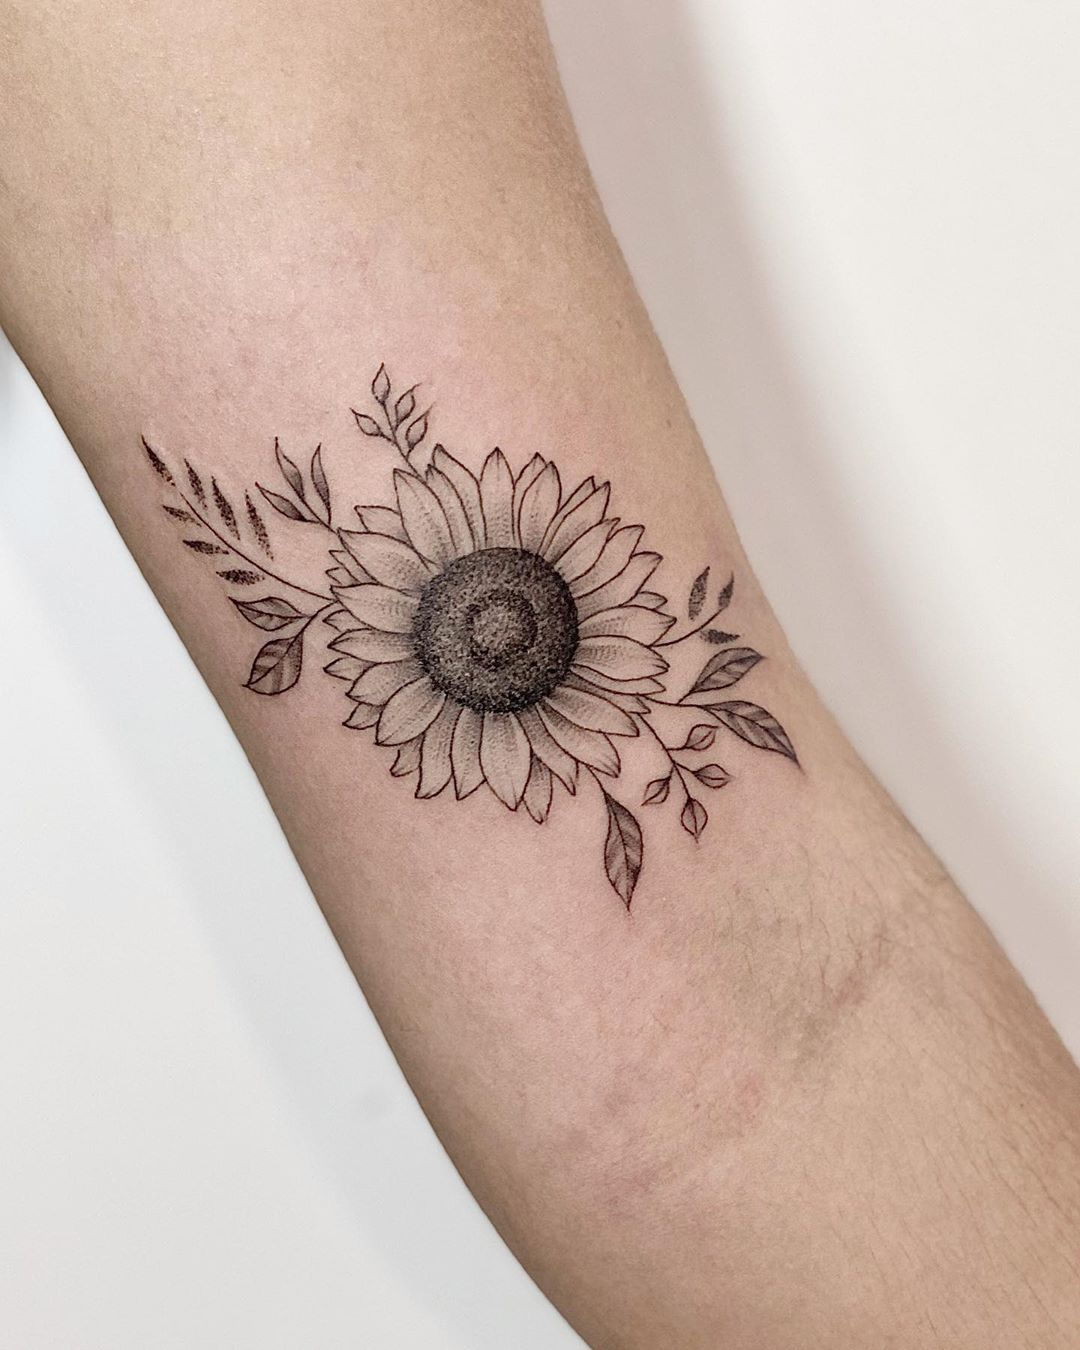 "Andrea Barreda on Instagram: ""🌻Diseño y Tattoo para Luisa Fernanda 🌻 • • • #inking #sunflower #sunflowertqttoo  #tattooing #instattoo  #inkedgirl #minitattoo #tattooer…"""